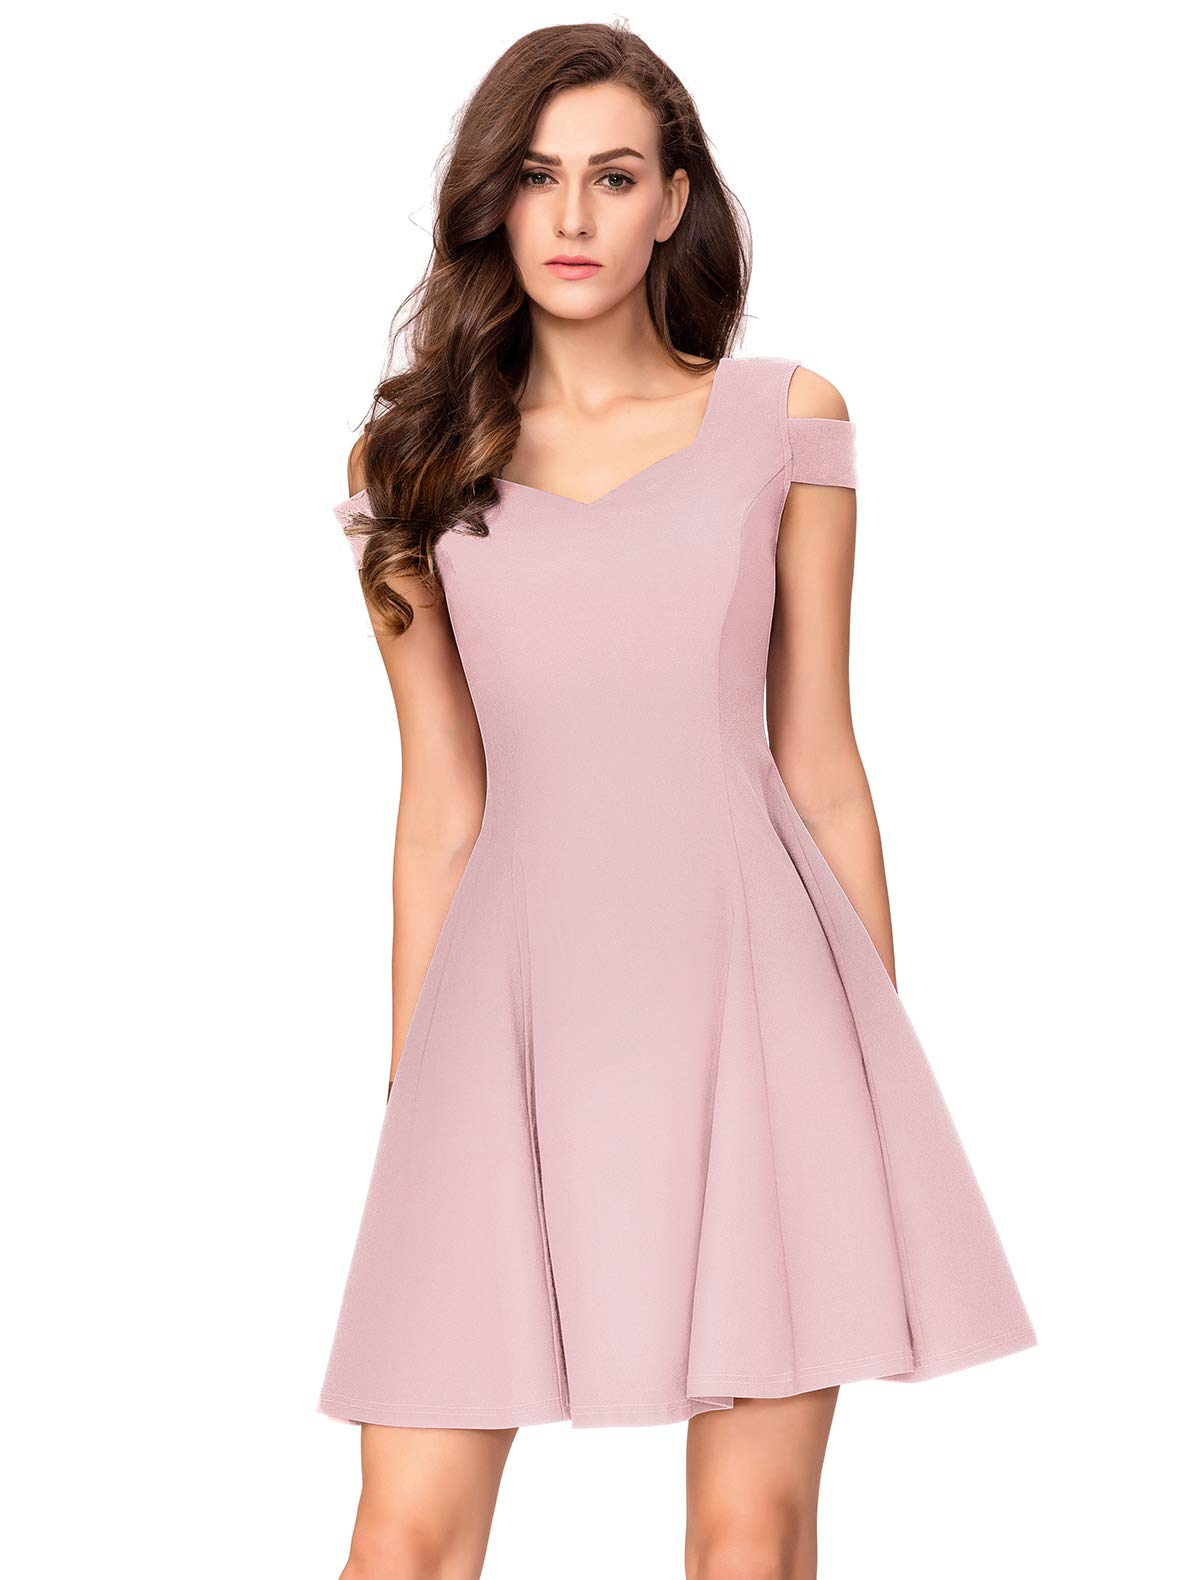 07f9edc7494 ... Dresses InsNova Women s Cold Shoulder Little Cocktail Party A-line  Skater Dress (Medium